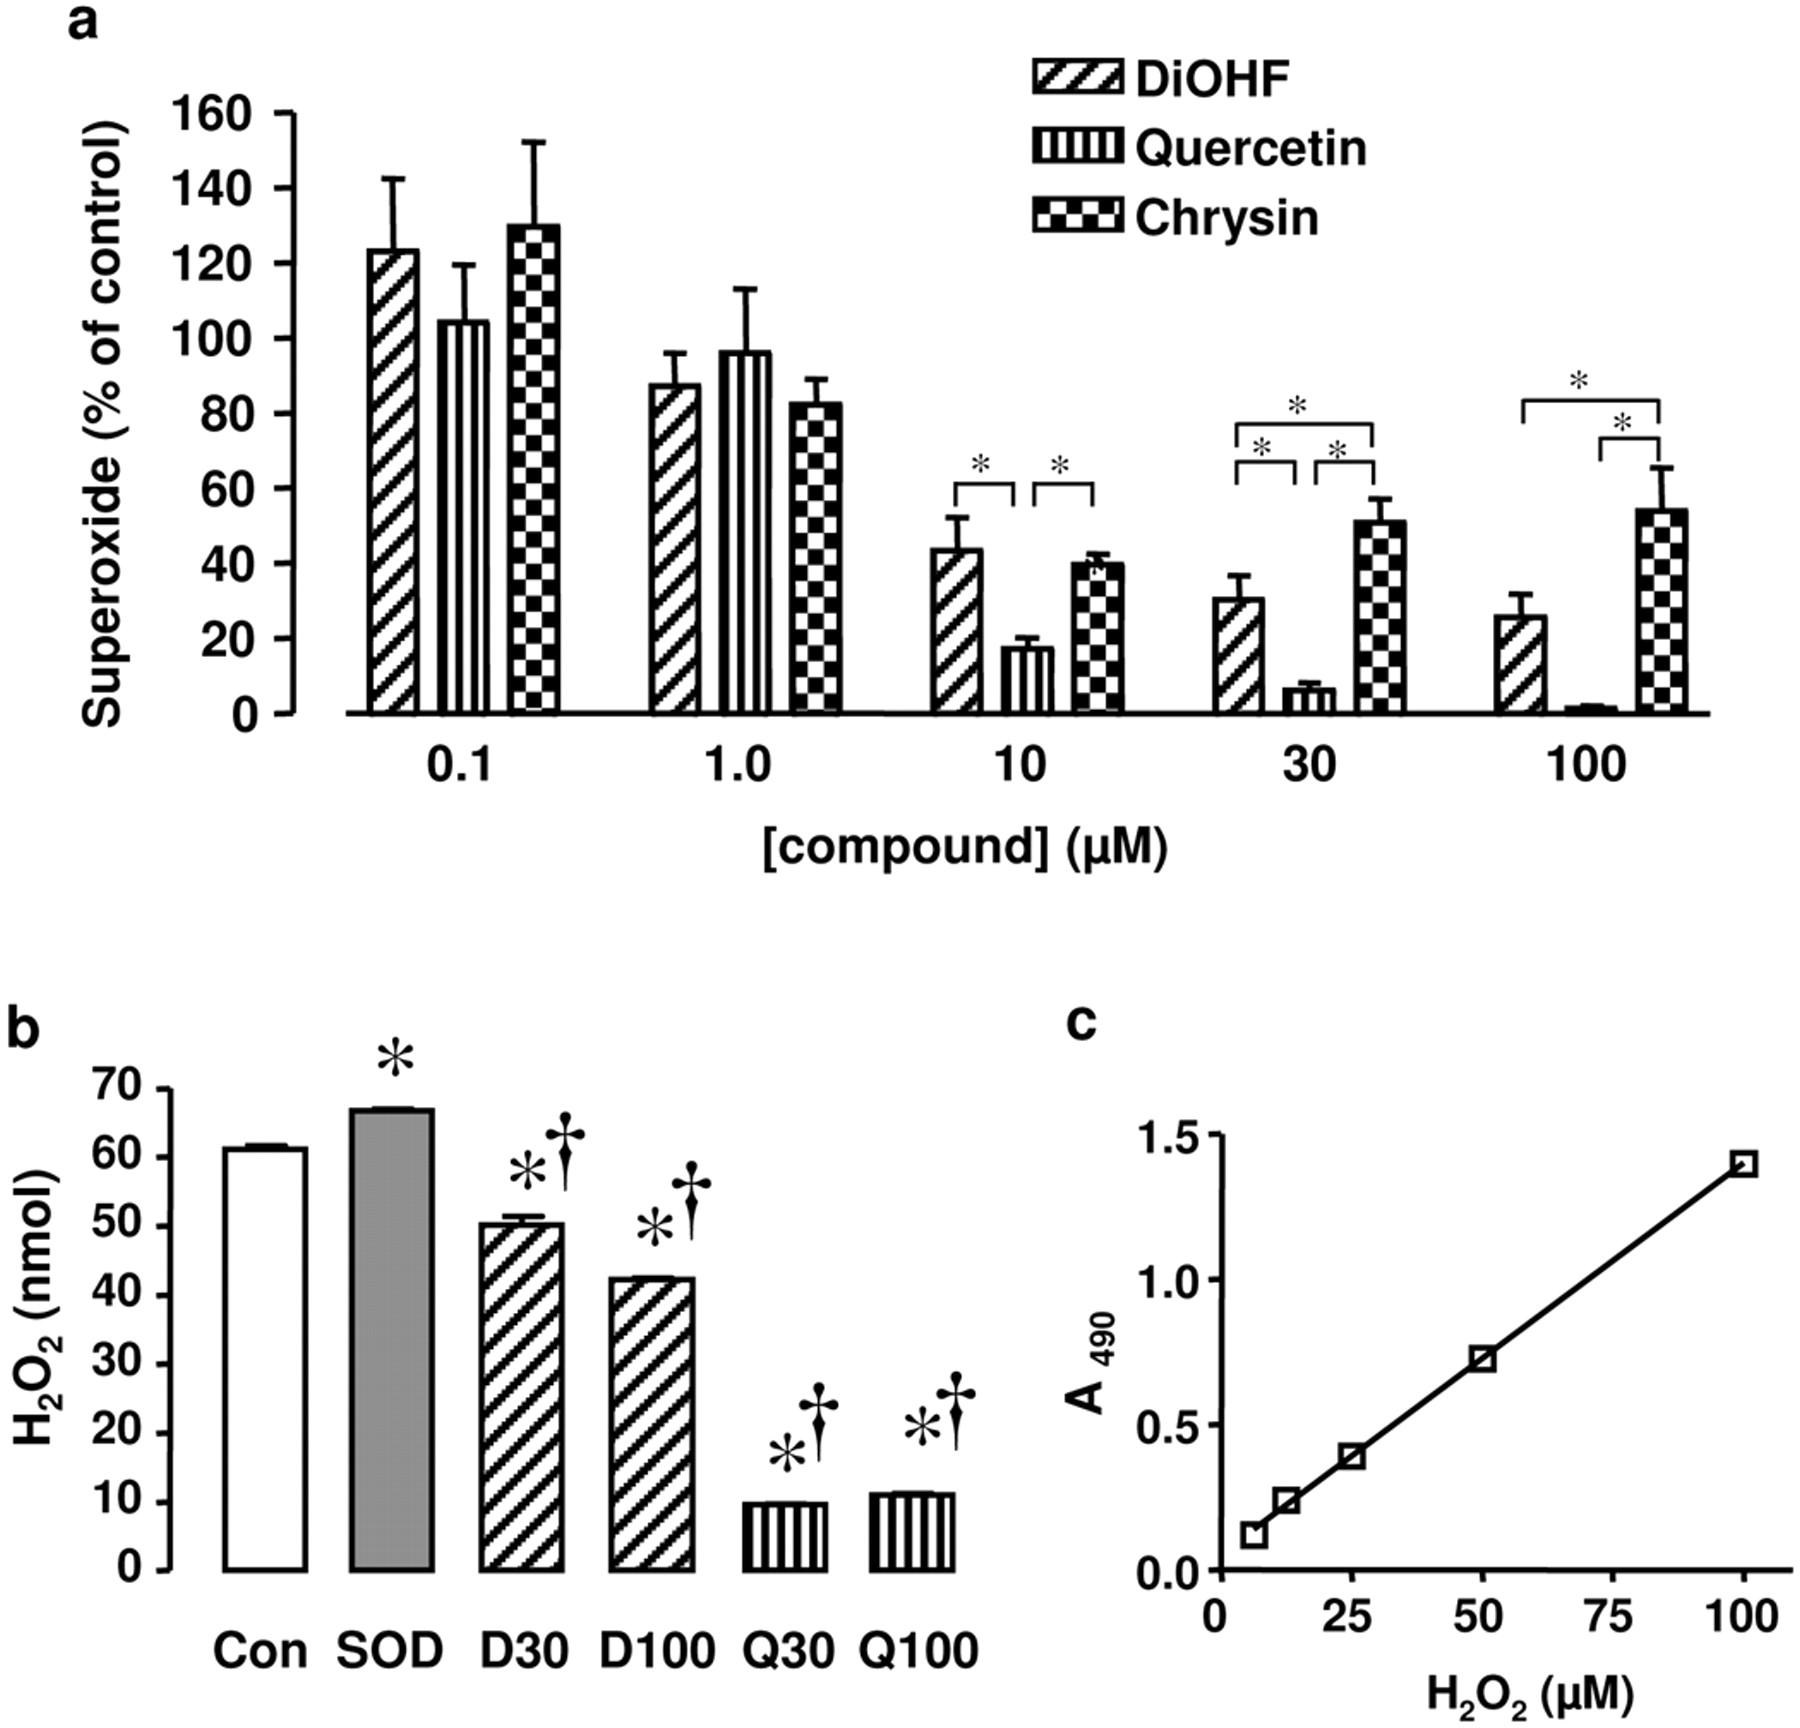 Modulation of Nicotinamide Adenine Dinucleotide Phosphate Oxidase